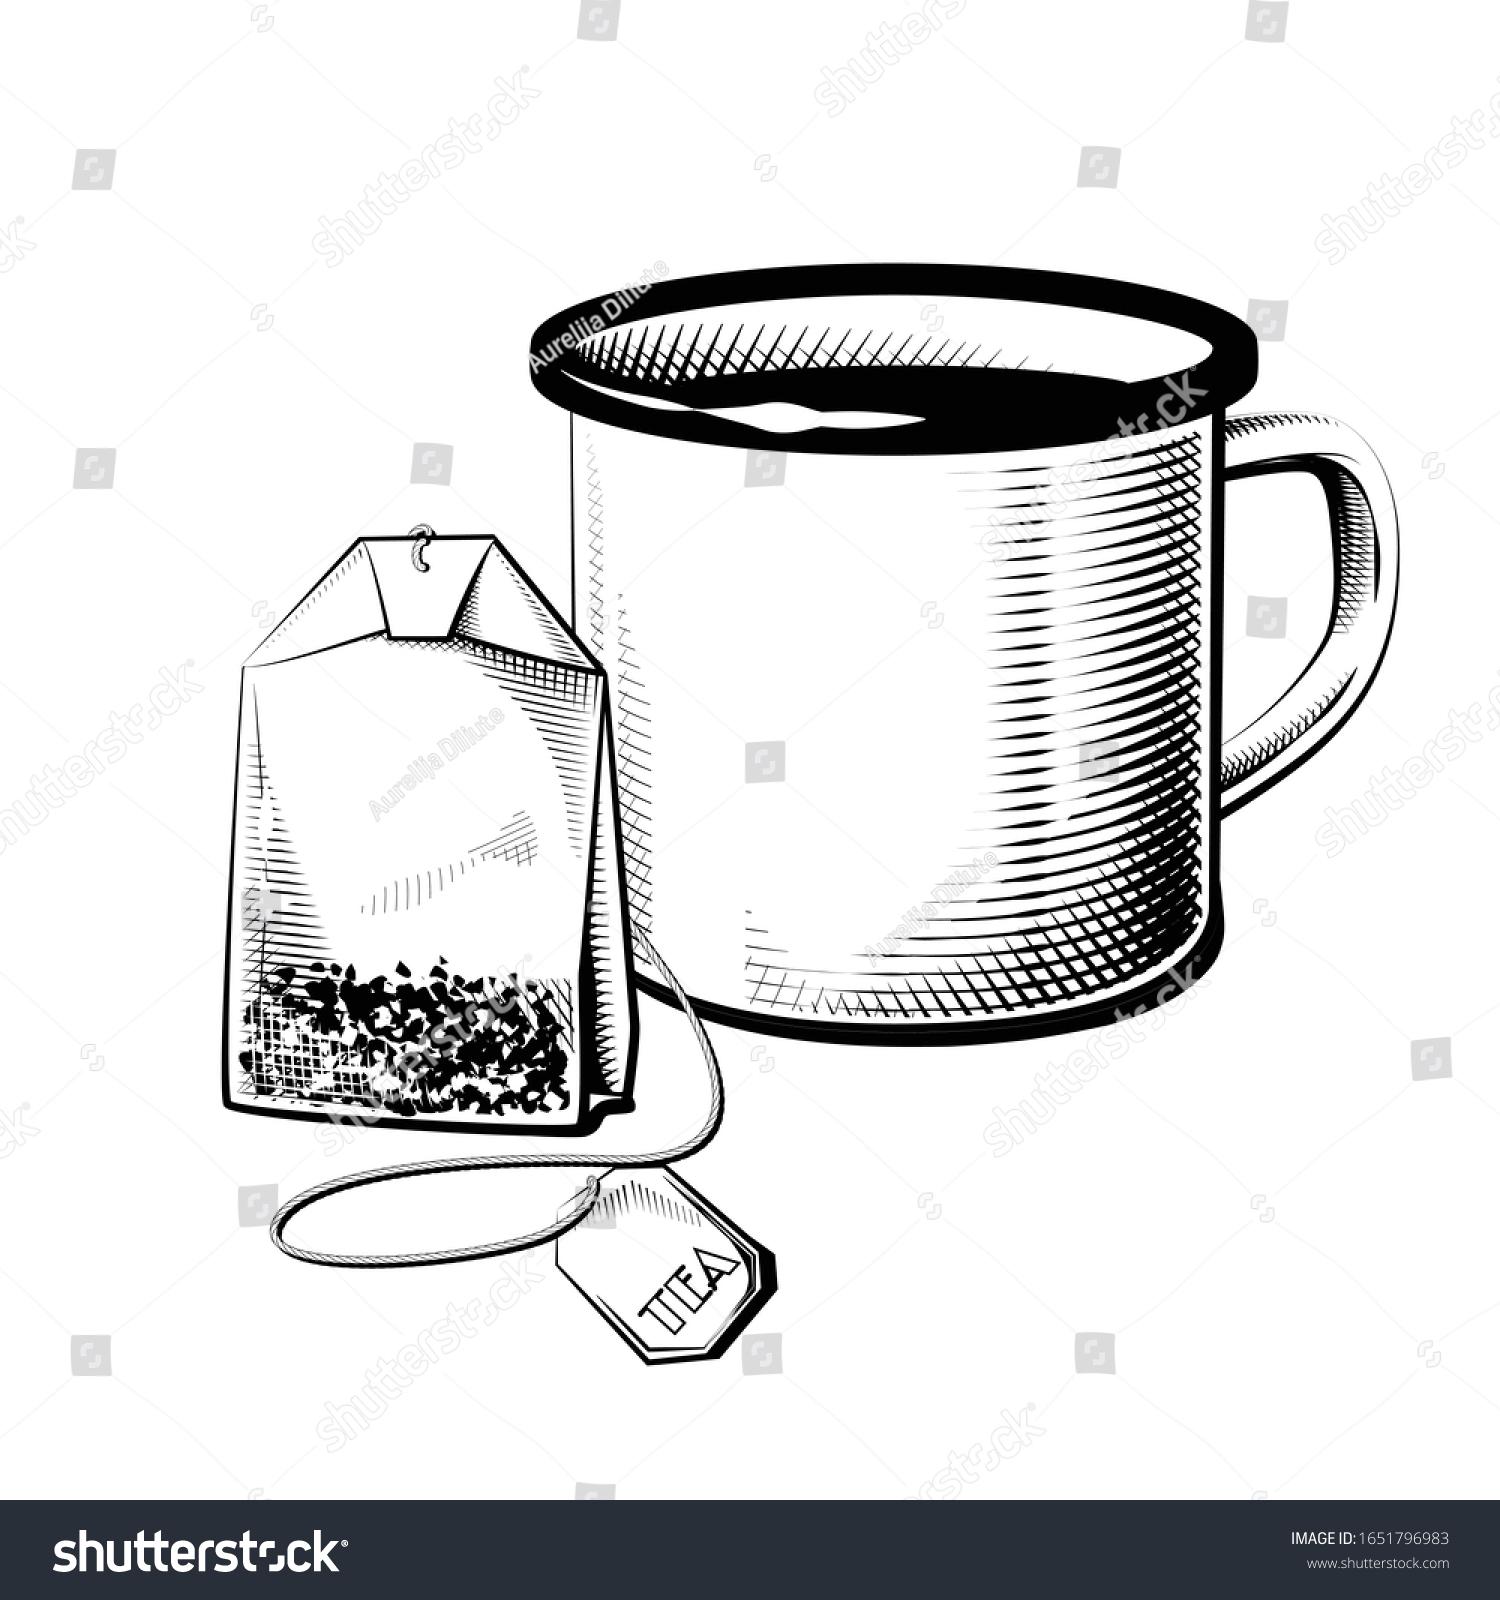 Detailed Enamel Mug Tea Bag Sketch Stock Vector Royalty Free 1651796983